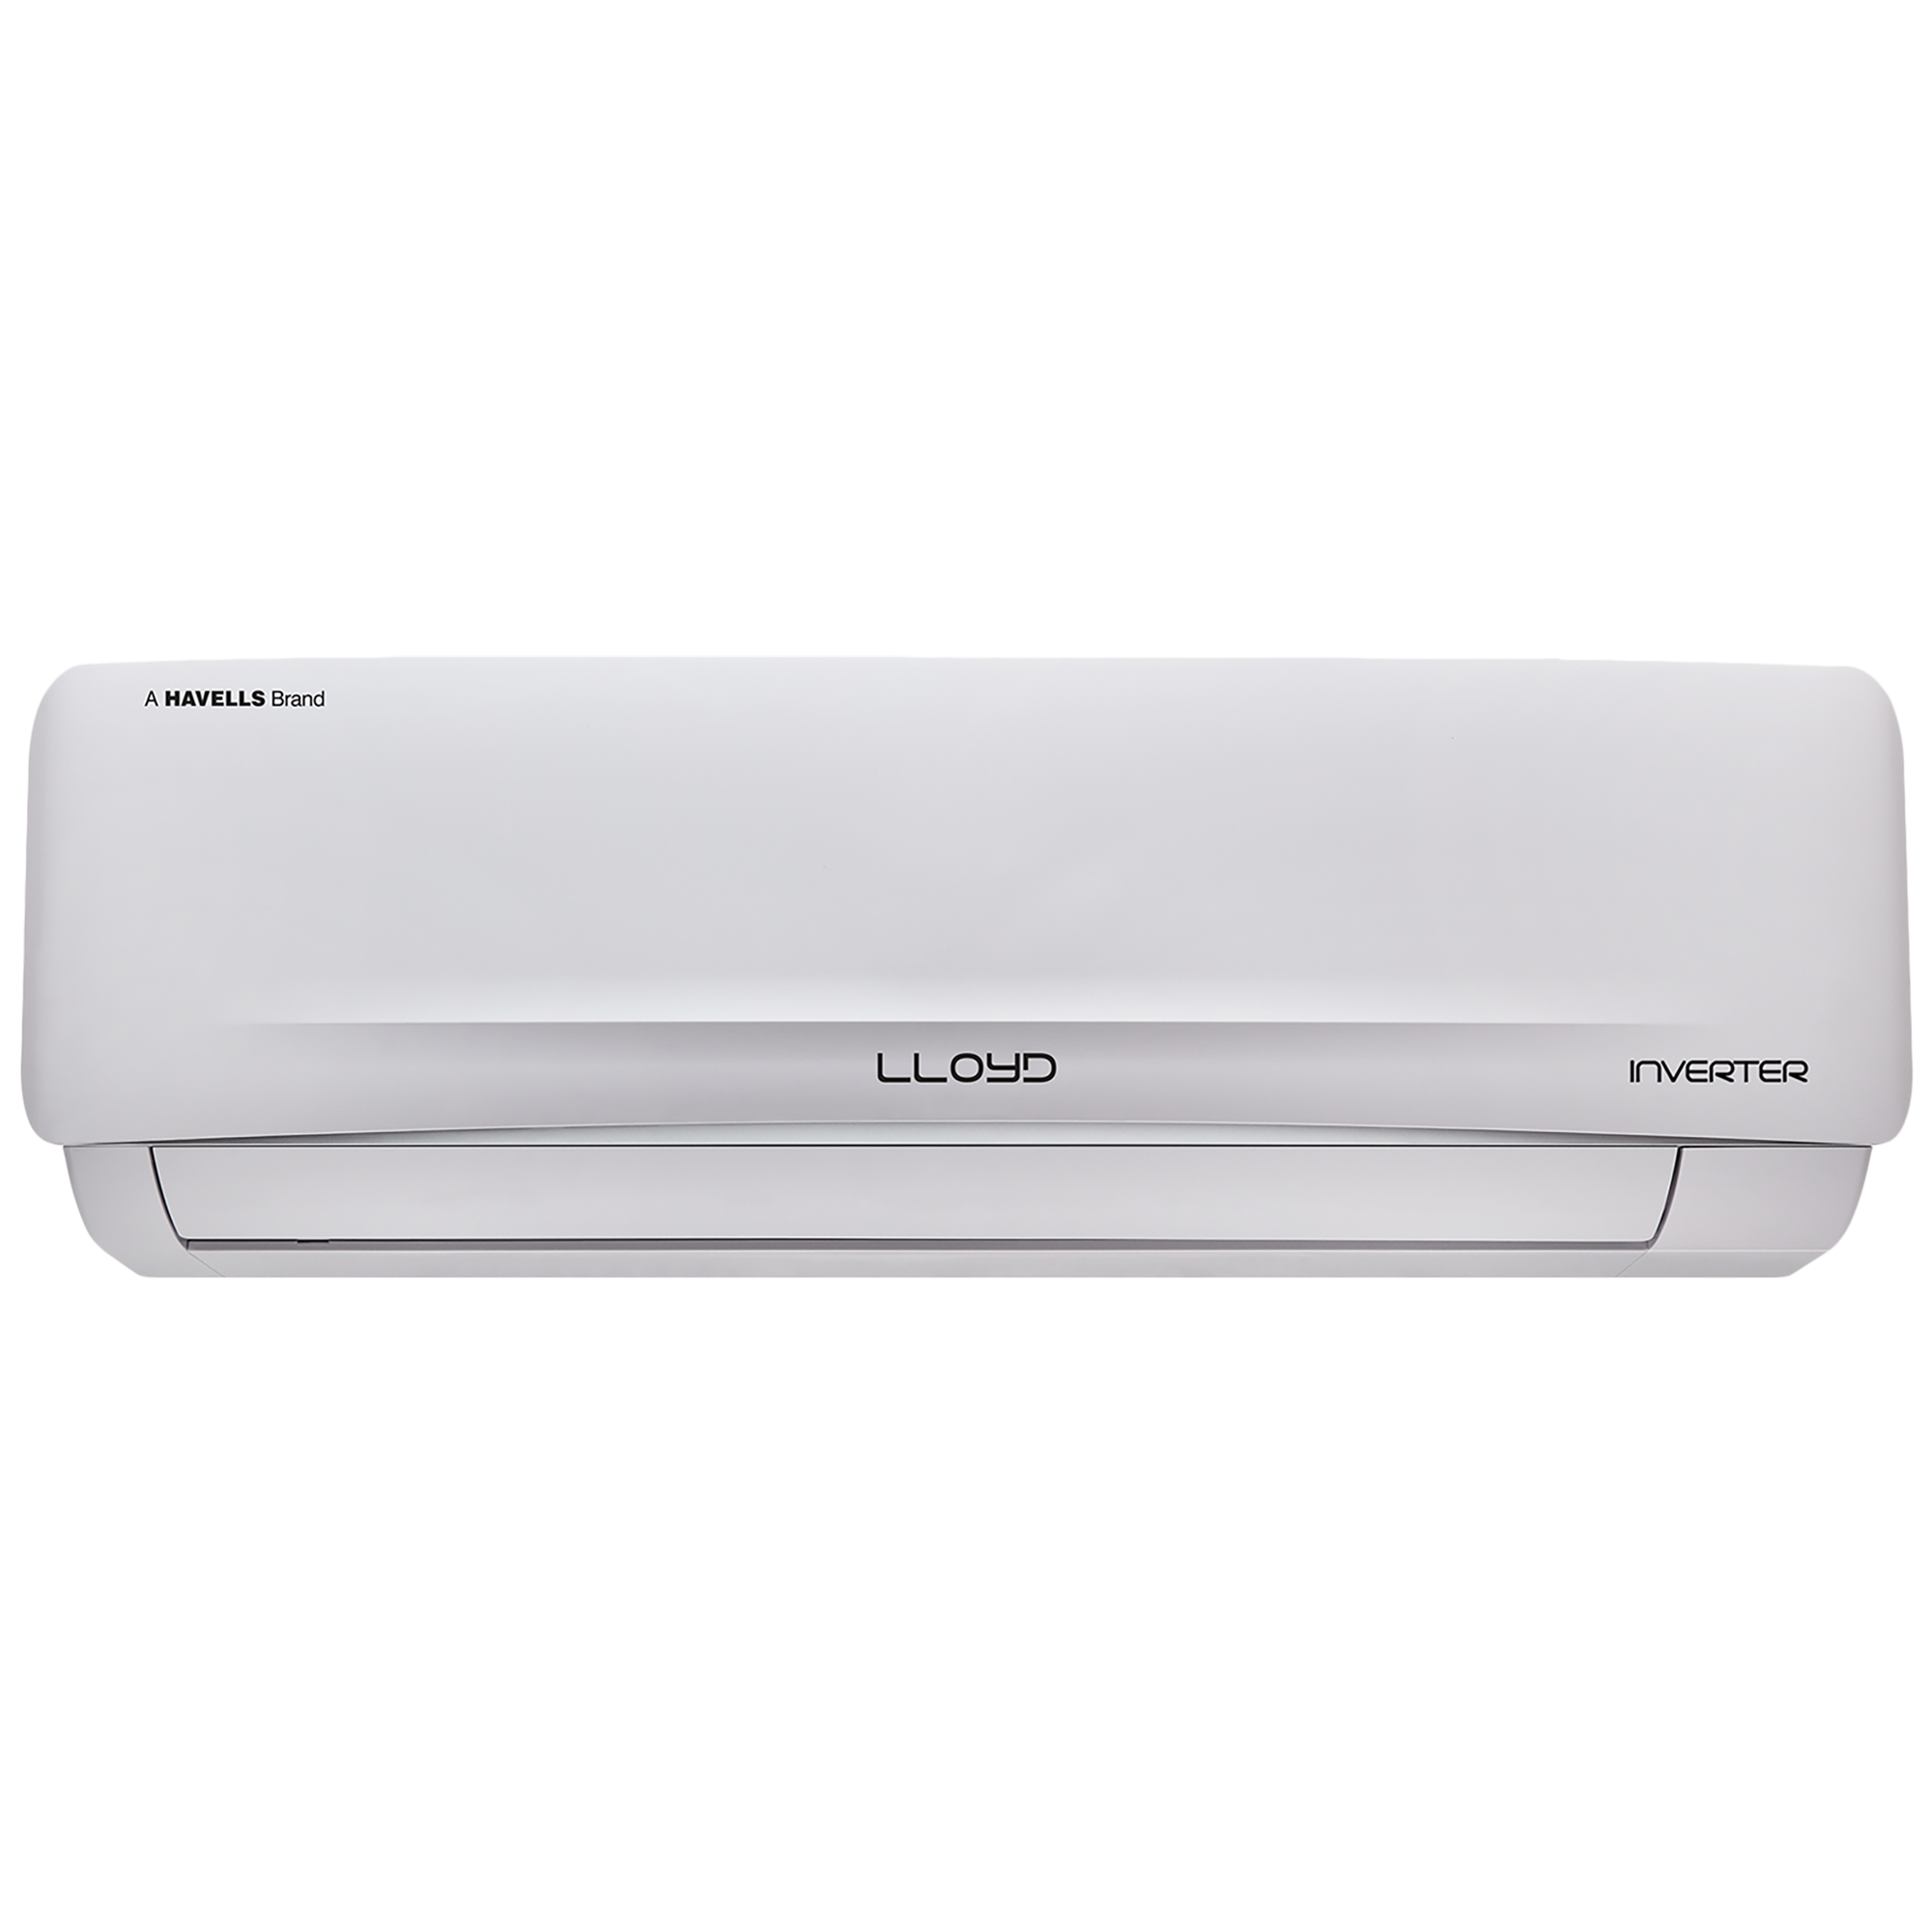 Lloyd WSEL 2 Ton 3 Star Inverter Split AC (Copper Condenser, GLS24I36WSEL, White)_1